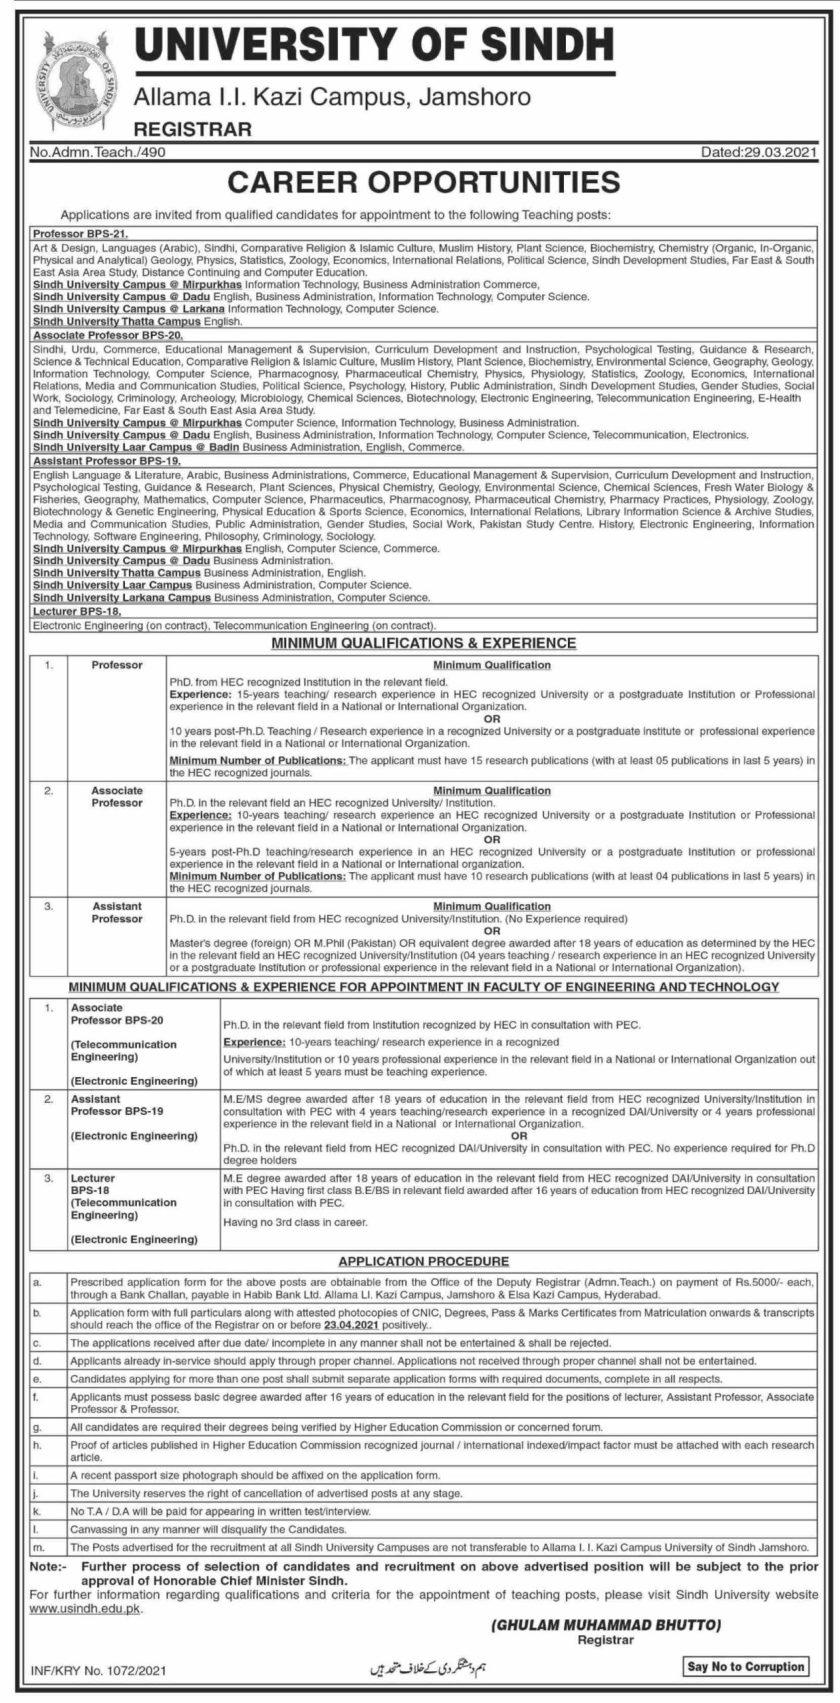 University of Sindh Jamshoro Sindh University Jobs 2021